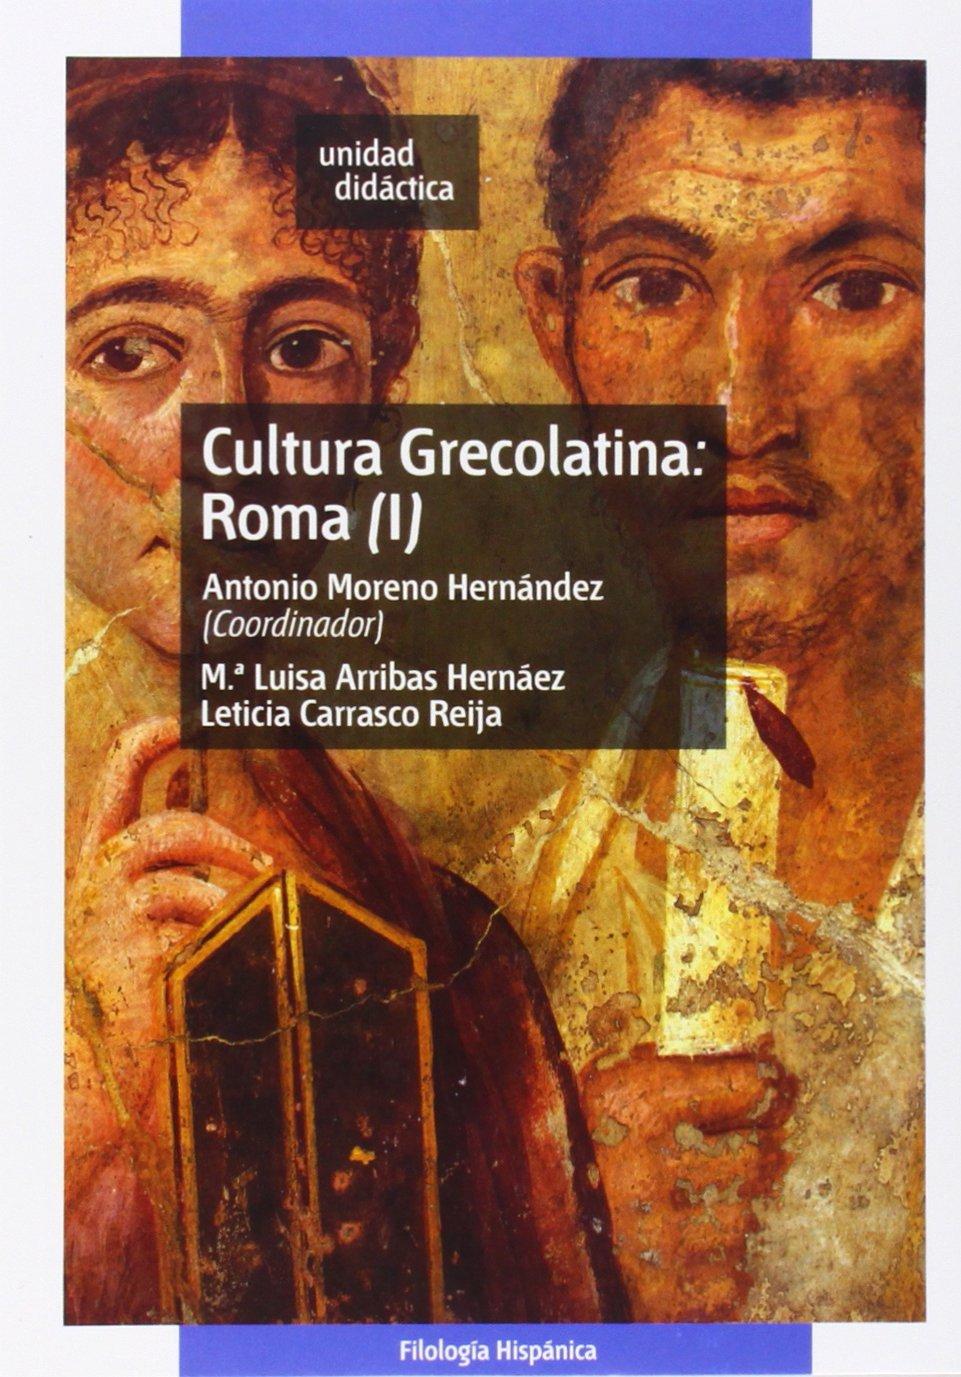 Cultura Grecolatina: Roma (I): 1 (UNIDAD DIDÁCTICA) Tapa blanda – 3 ene 2008 Antonio MORENO HERNÁNDEZ Mª Luisa ARRIBAS HERNÁEZ Leticia CARRASCO REIJA UNED